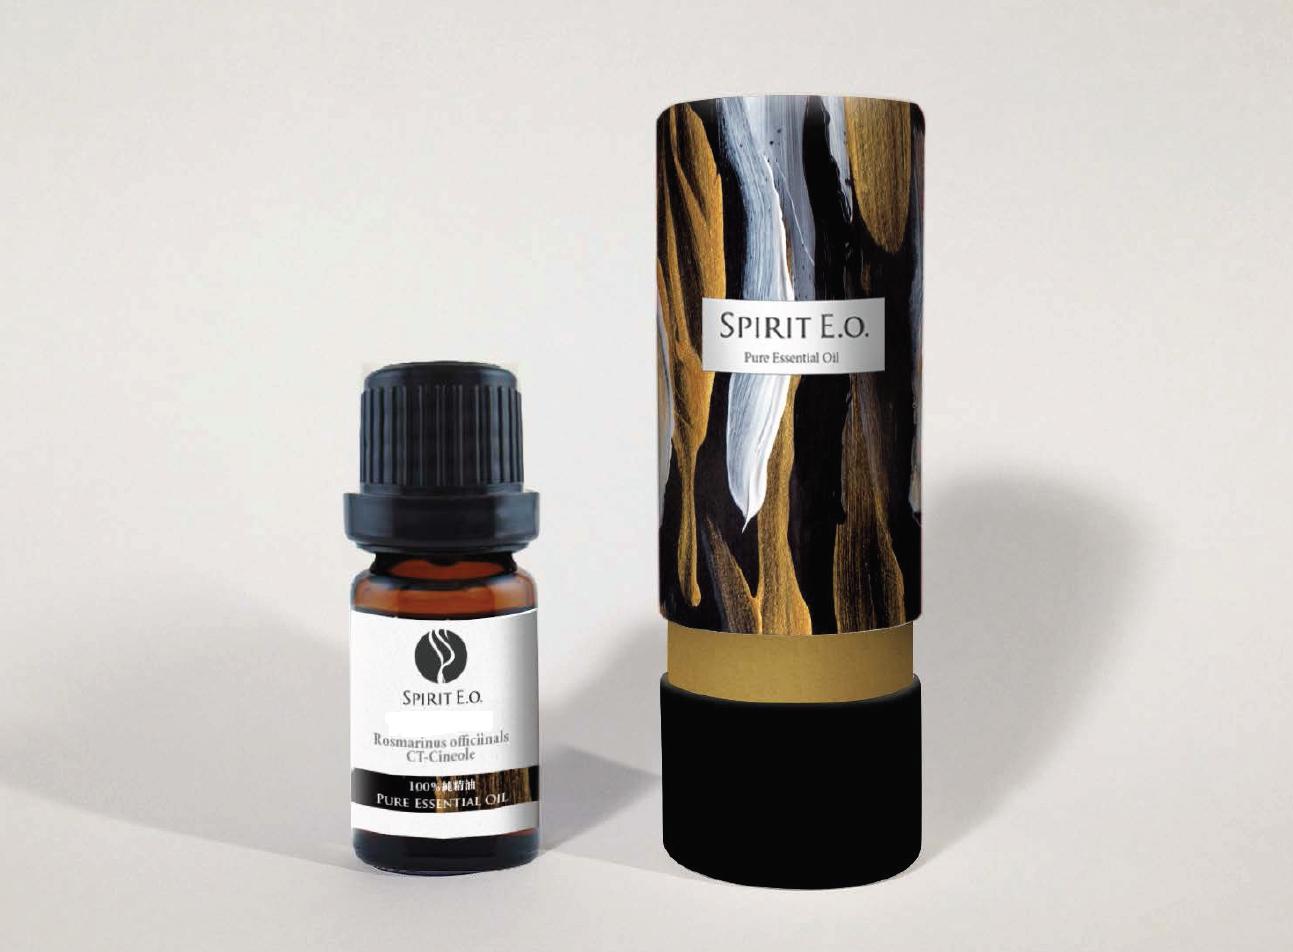 【Spirit E.O.】快樂鼠尾草純精油 10ML